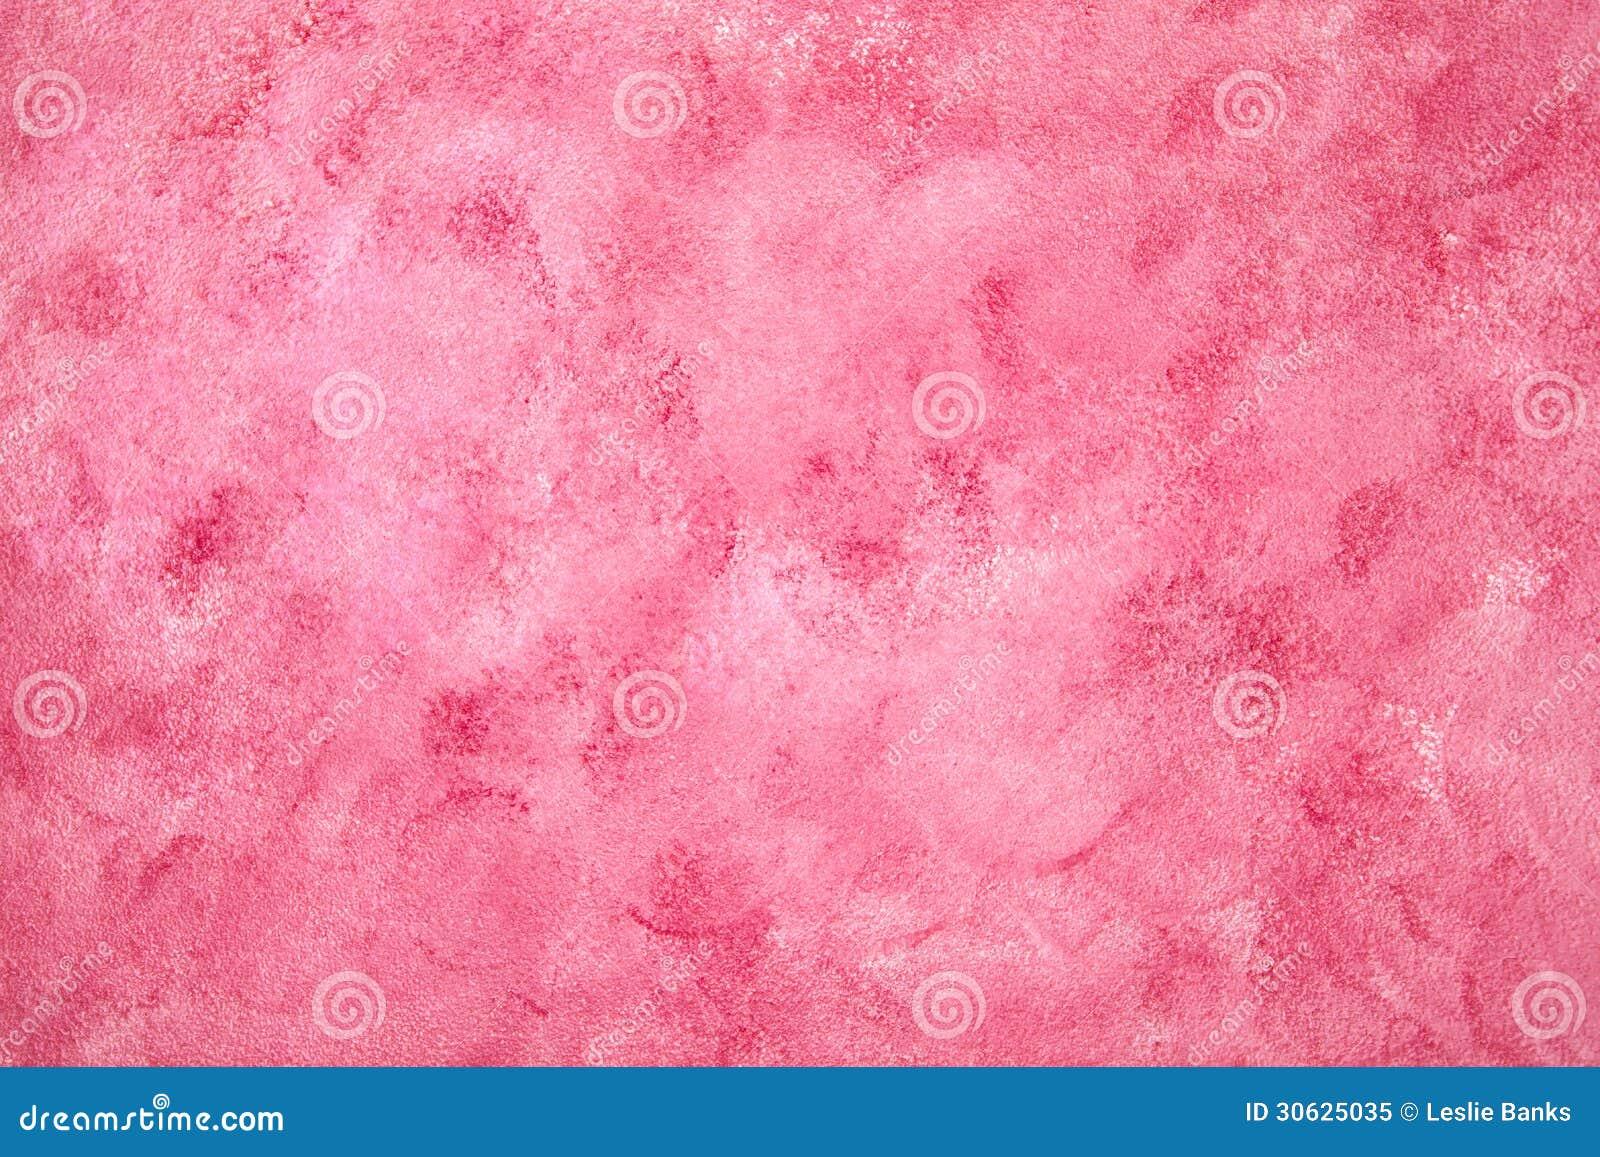 pink wallpaper hd 1080p